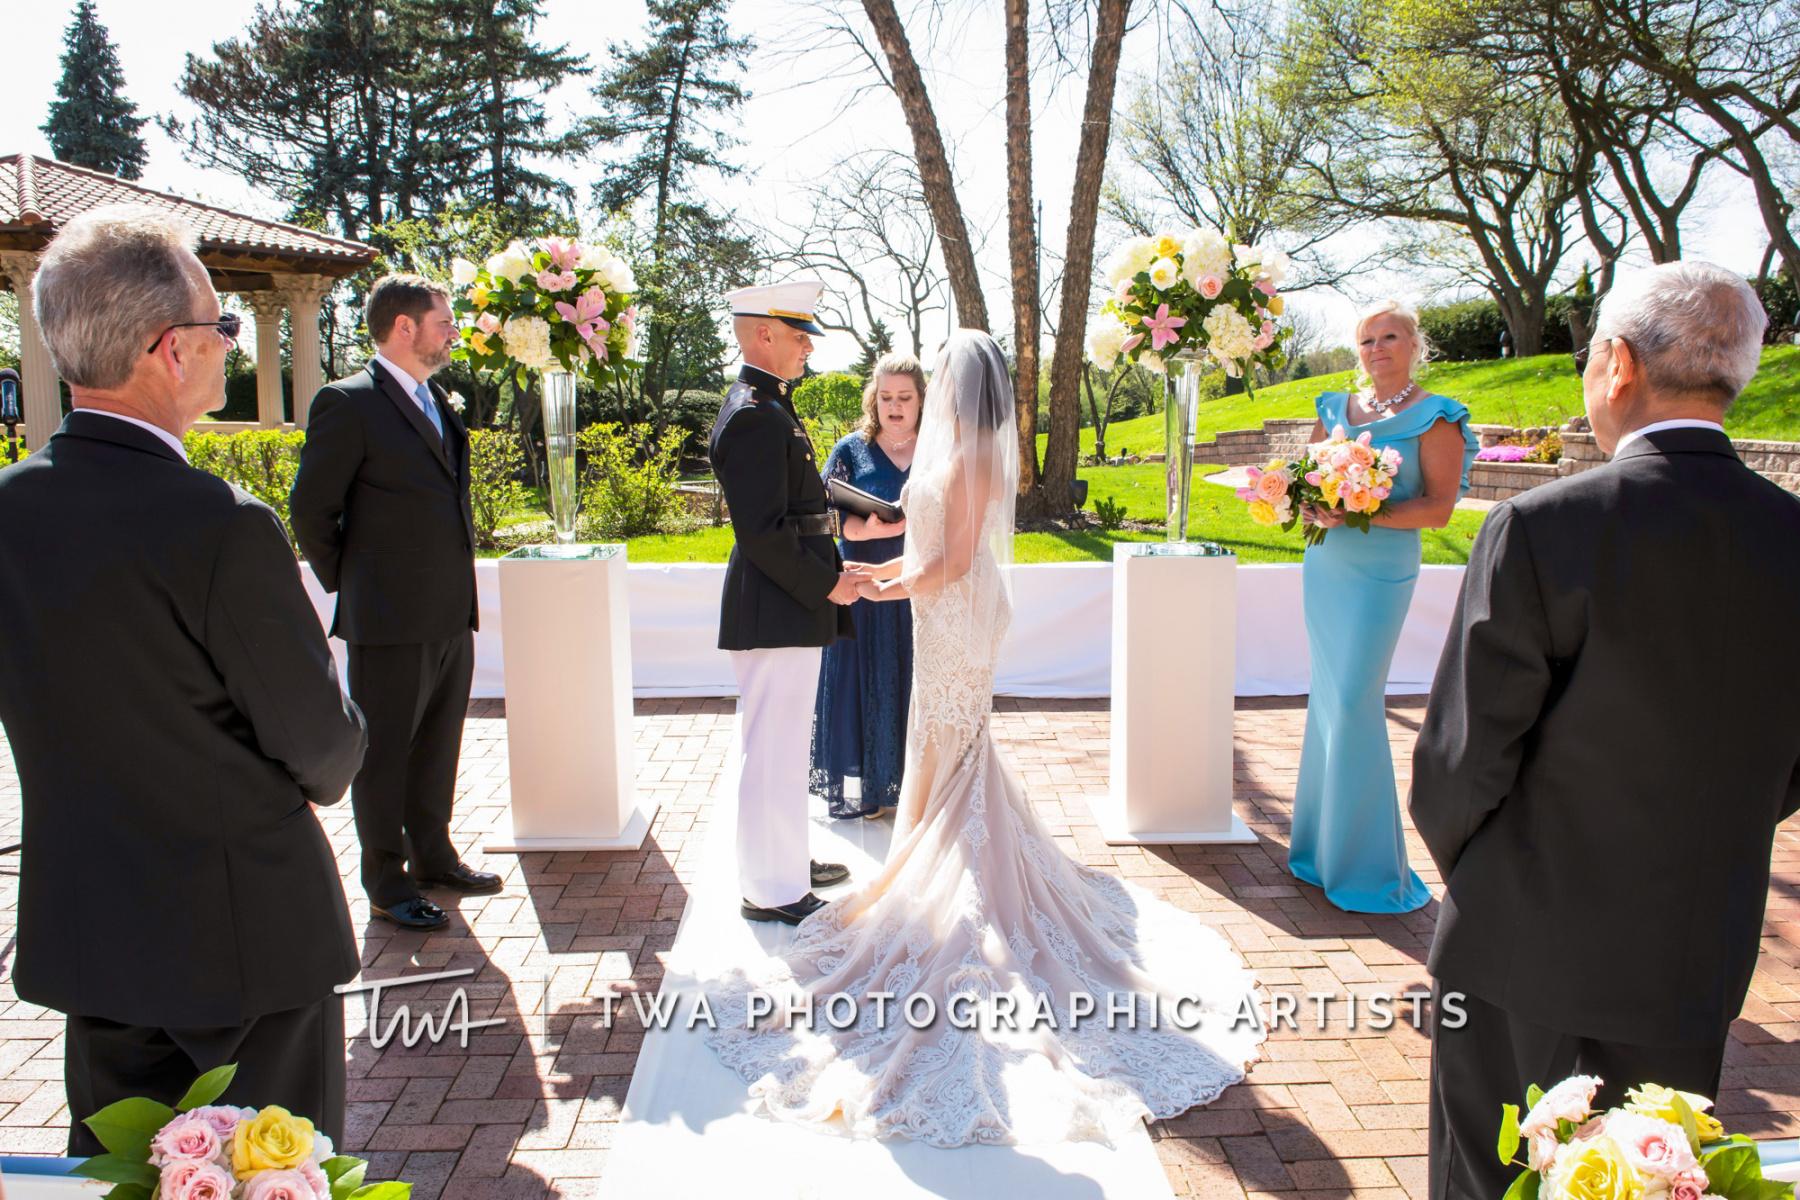 Chicago-Wedding-Photographer-TWA-Photographic-Artists-Drake-Oakbrook_Bermas_Zweifeld-0365